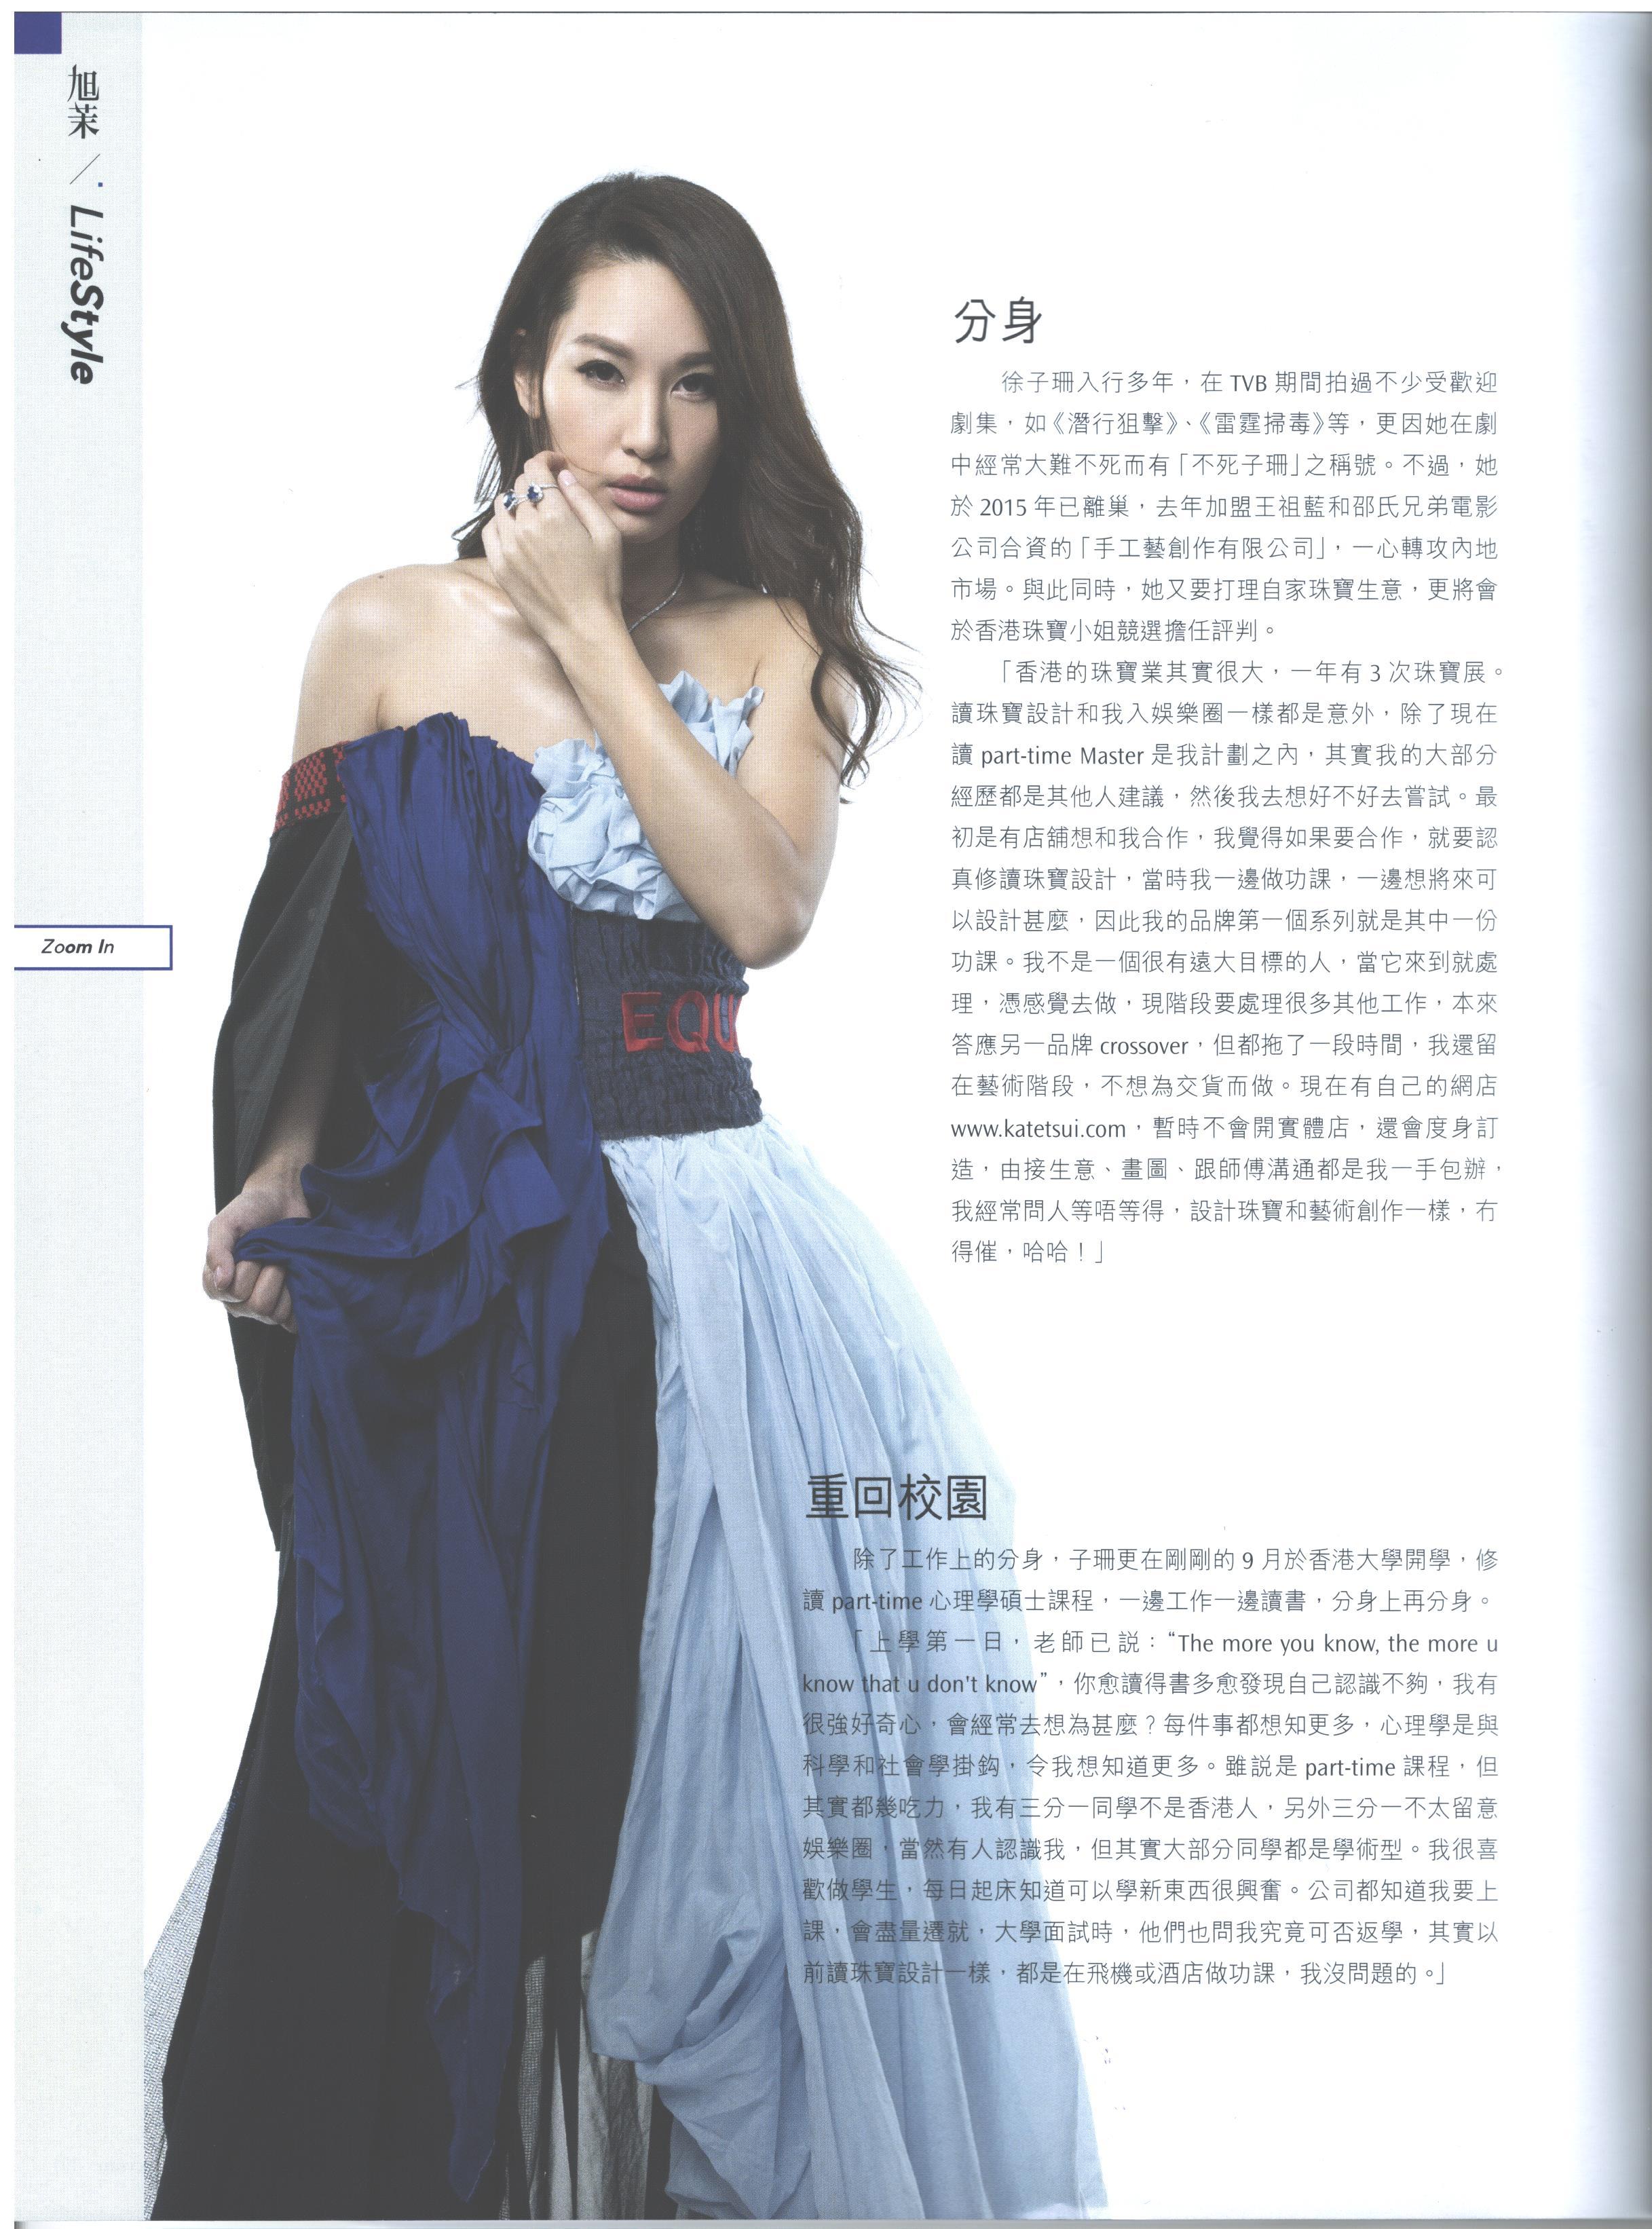 2017.10.13_Jessica_Kate Tsui wears alumni outfits (pg.3).jpg